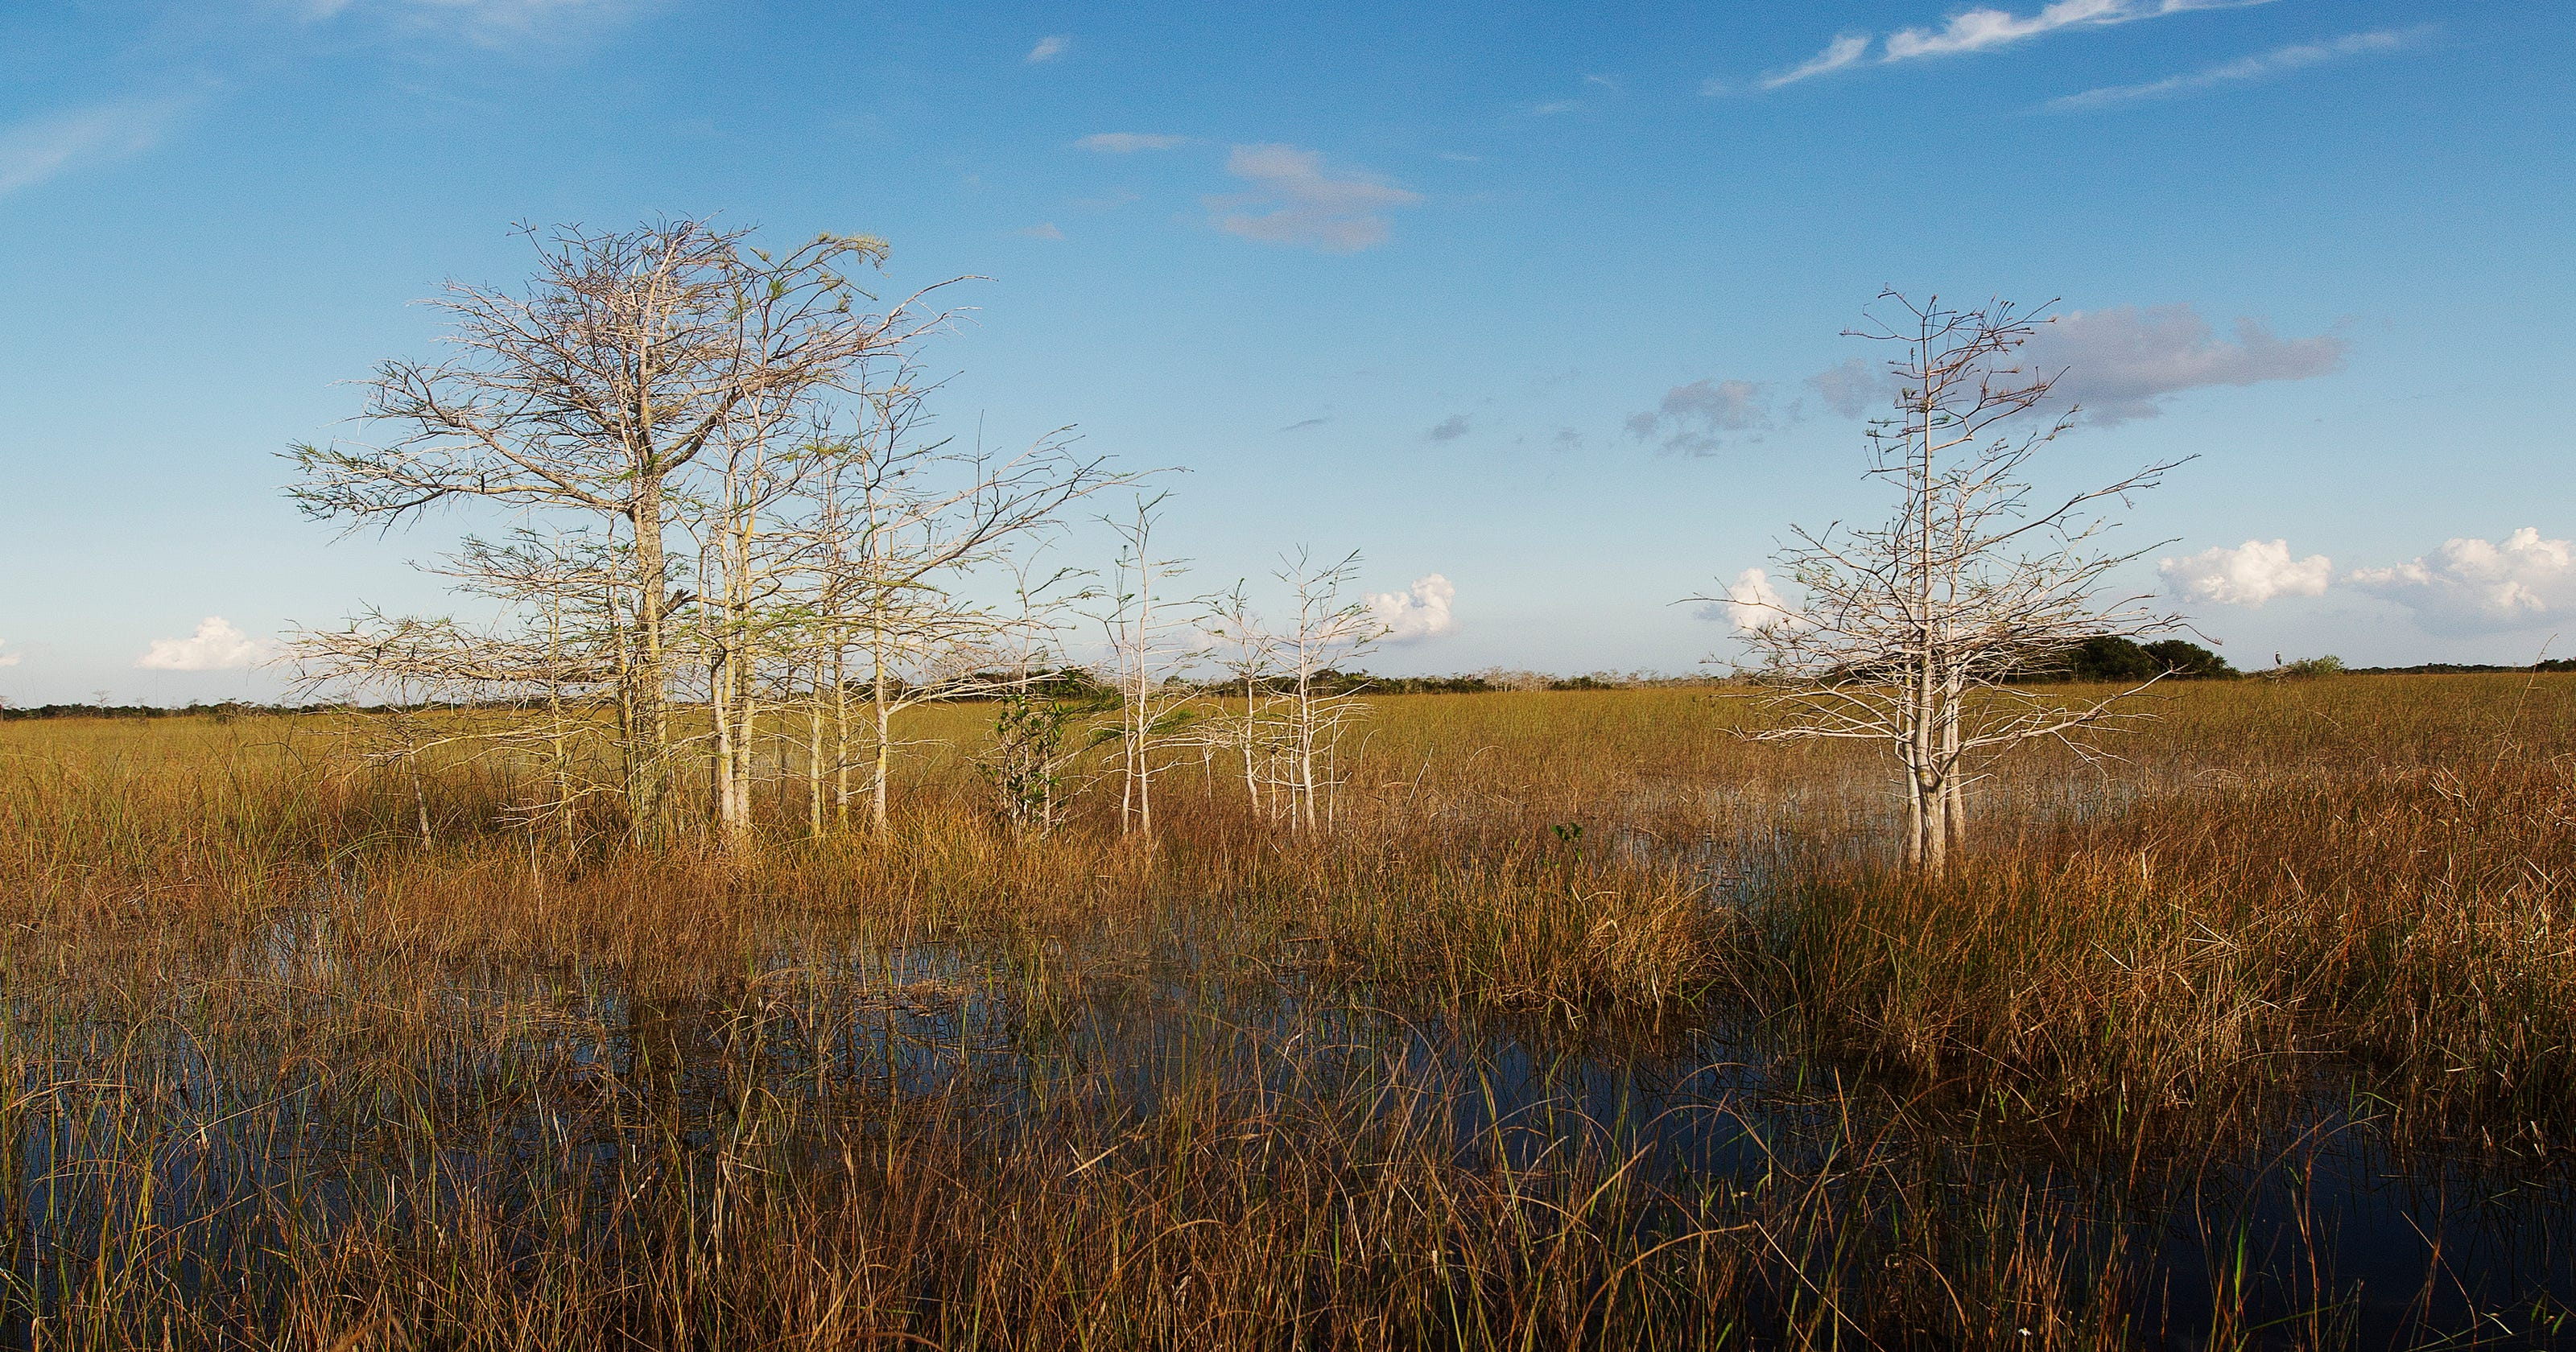 Water bill authorizes $2 billion for Everglades